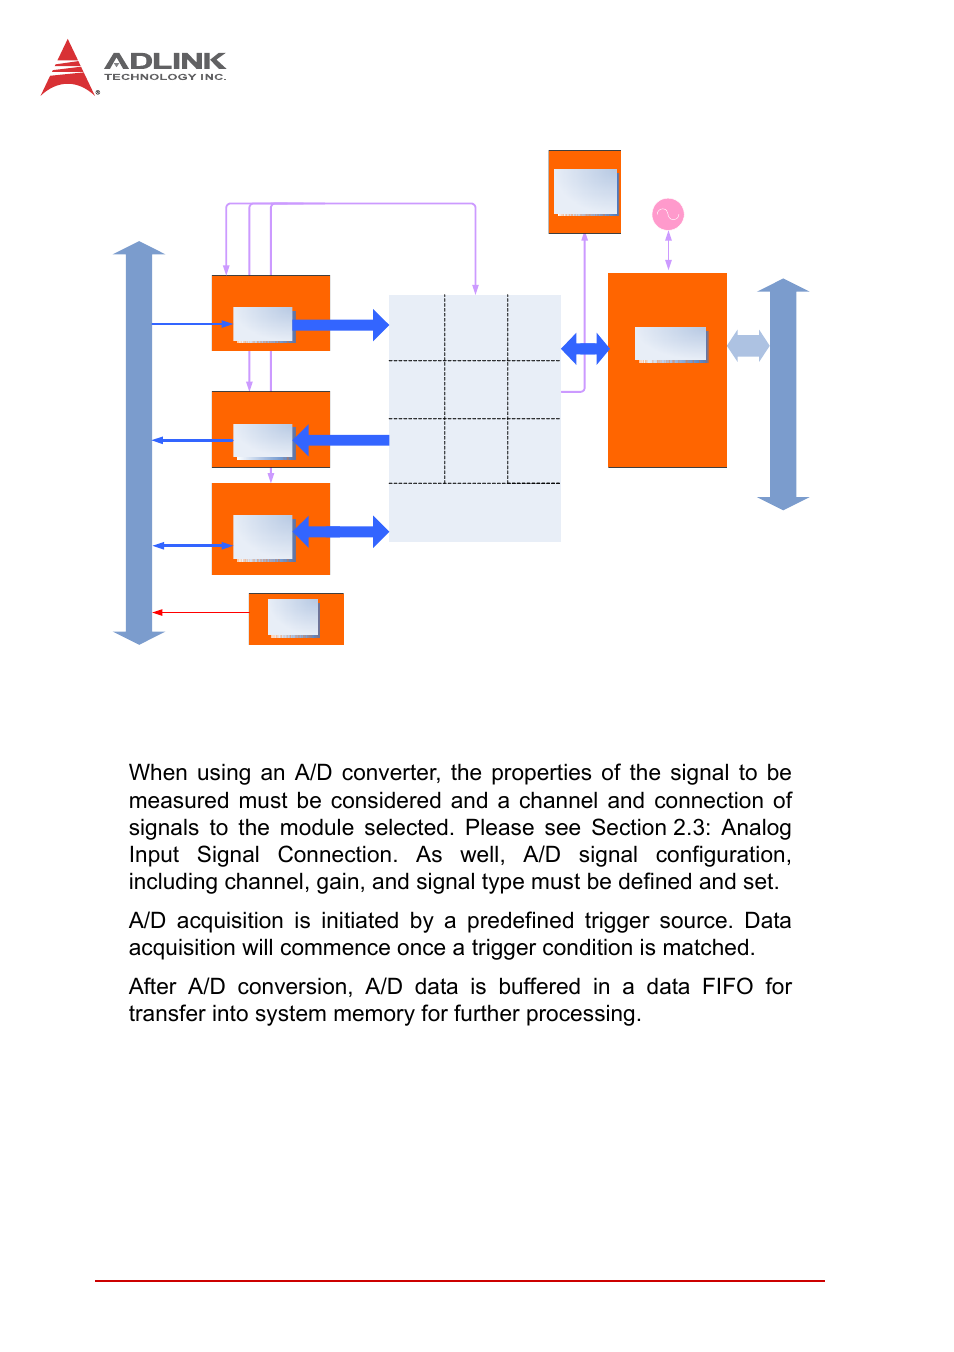 2 a/d conversion, A/d conversion, Figure 4-1 | ADLINK USB